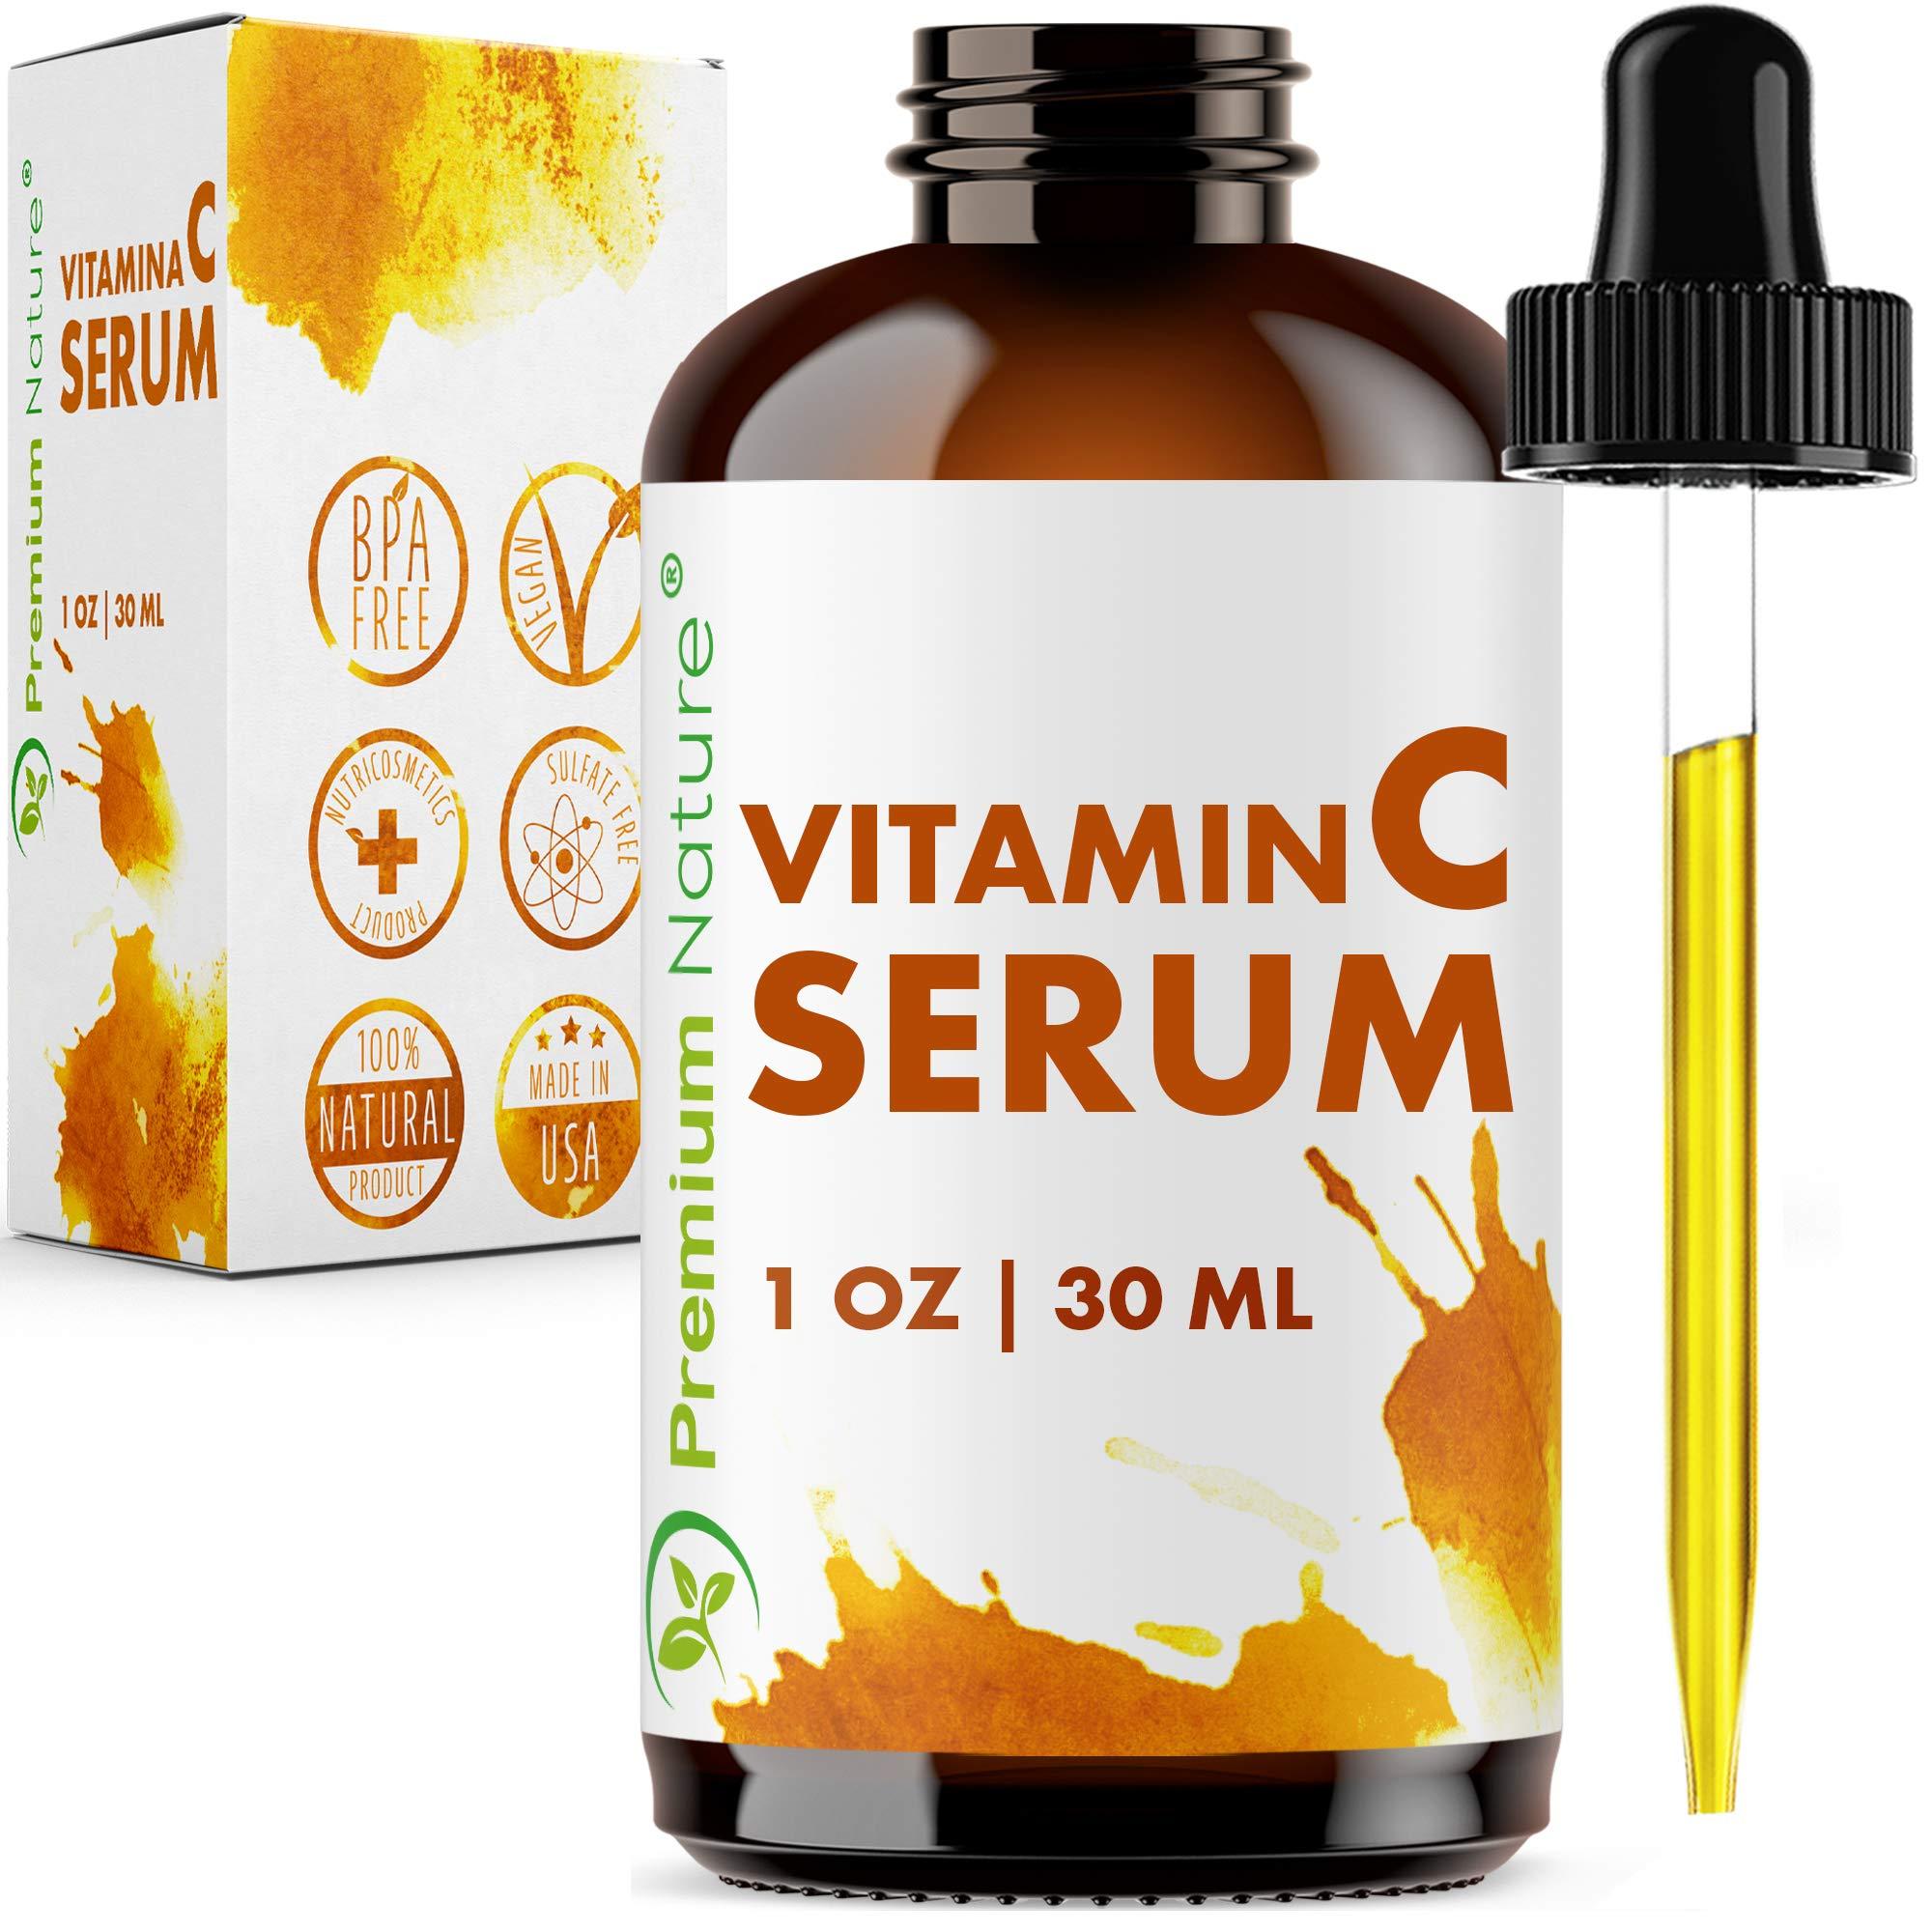 Vitamin C Serum Hyaluronic Acid - 20% Vit C Face Cream with pure Ingredients Facial Skin Serum Wrinkle & Sun Spot Hydrating Pore Minimizer Packaging May Vary